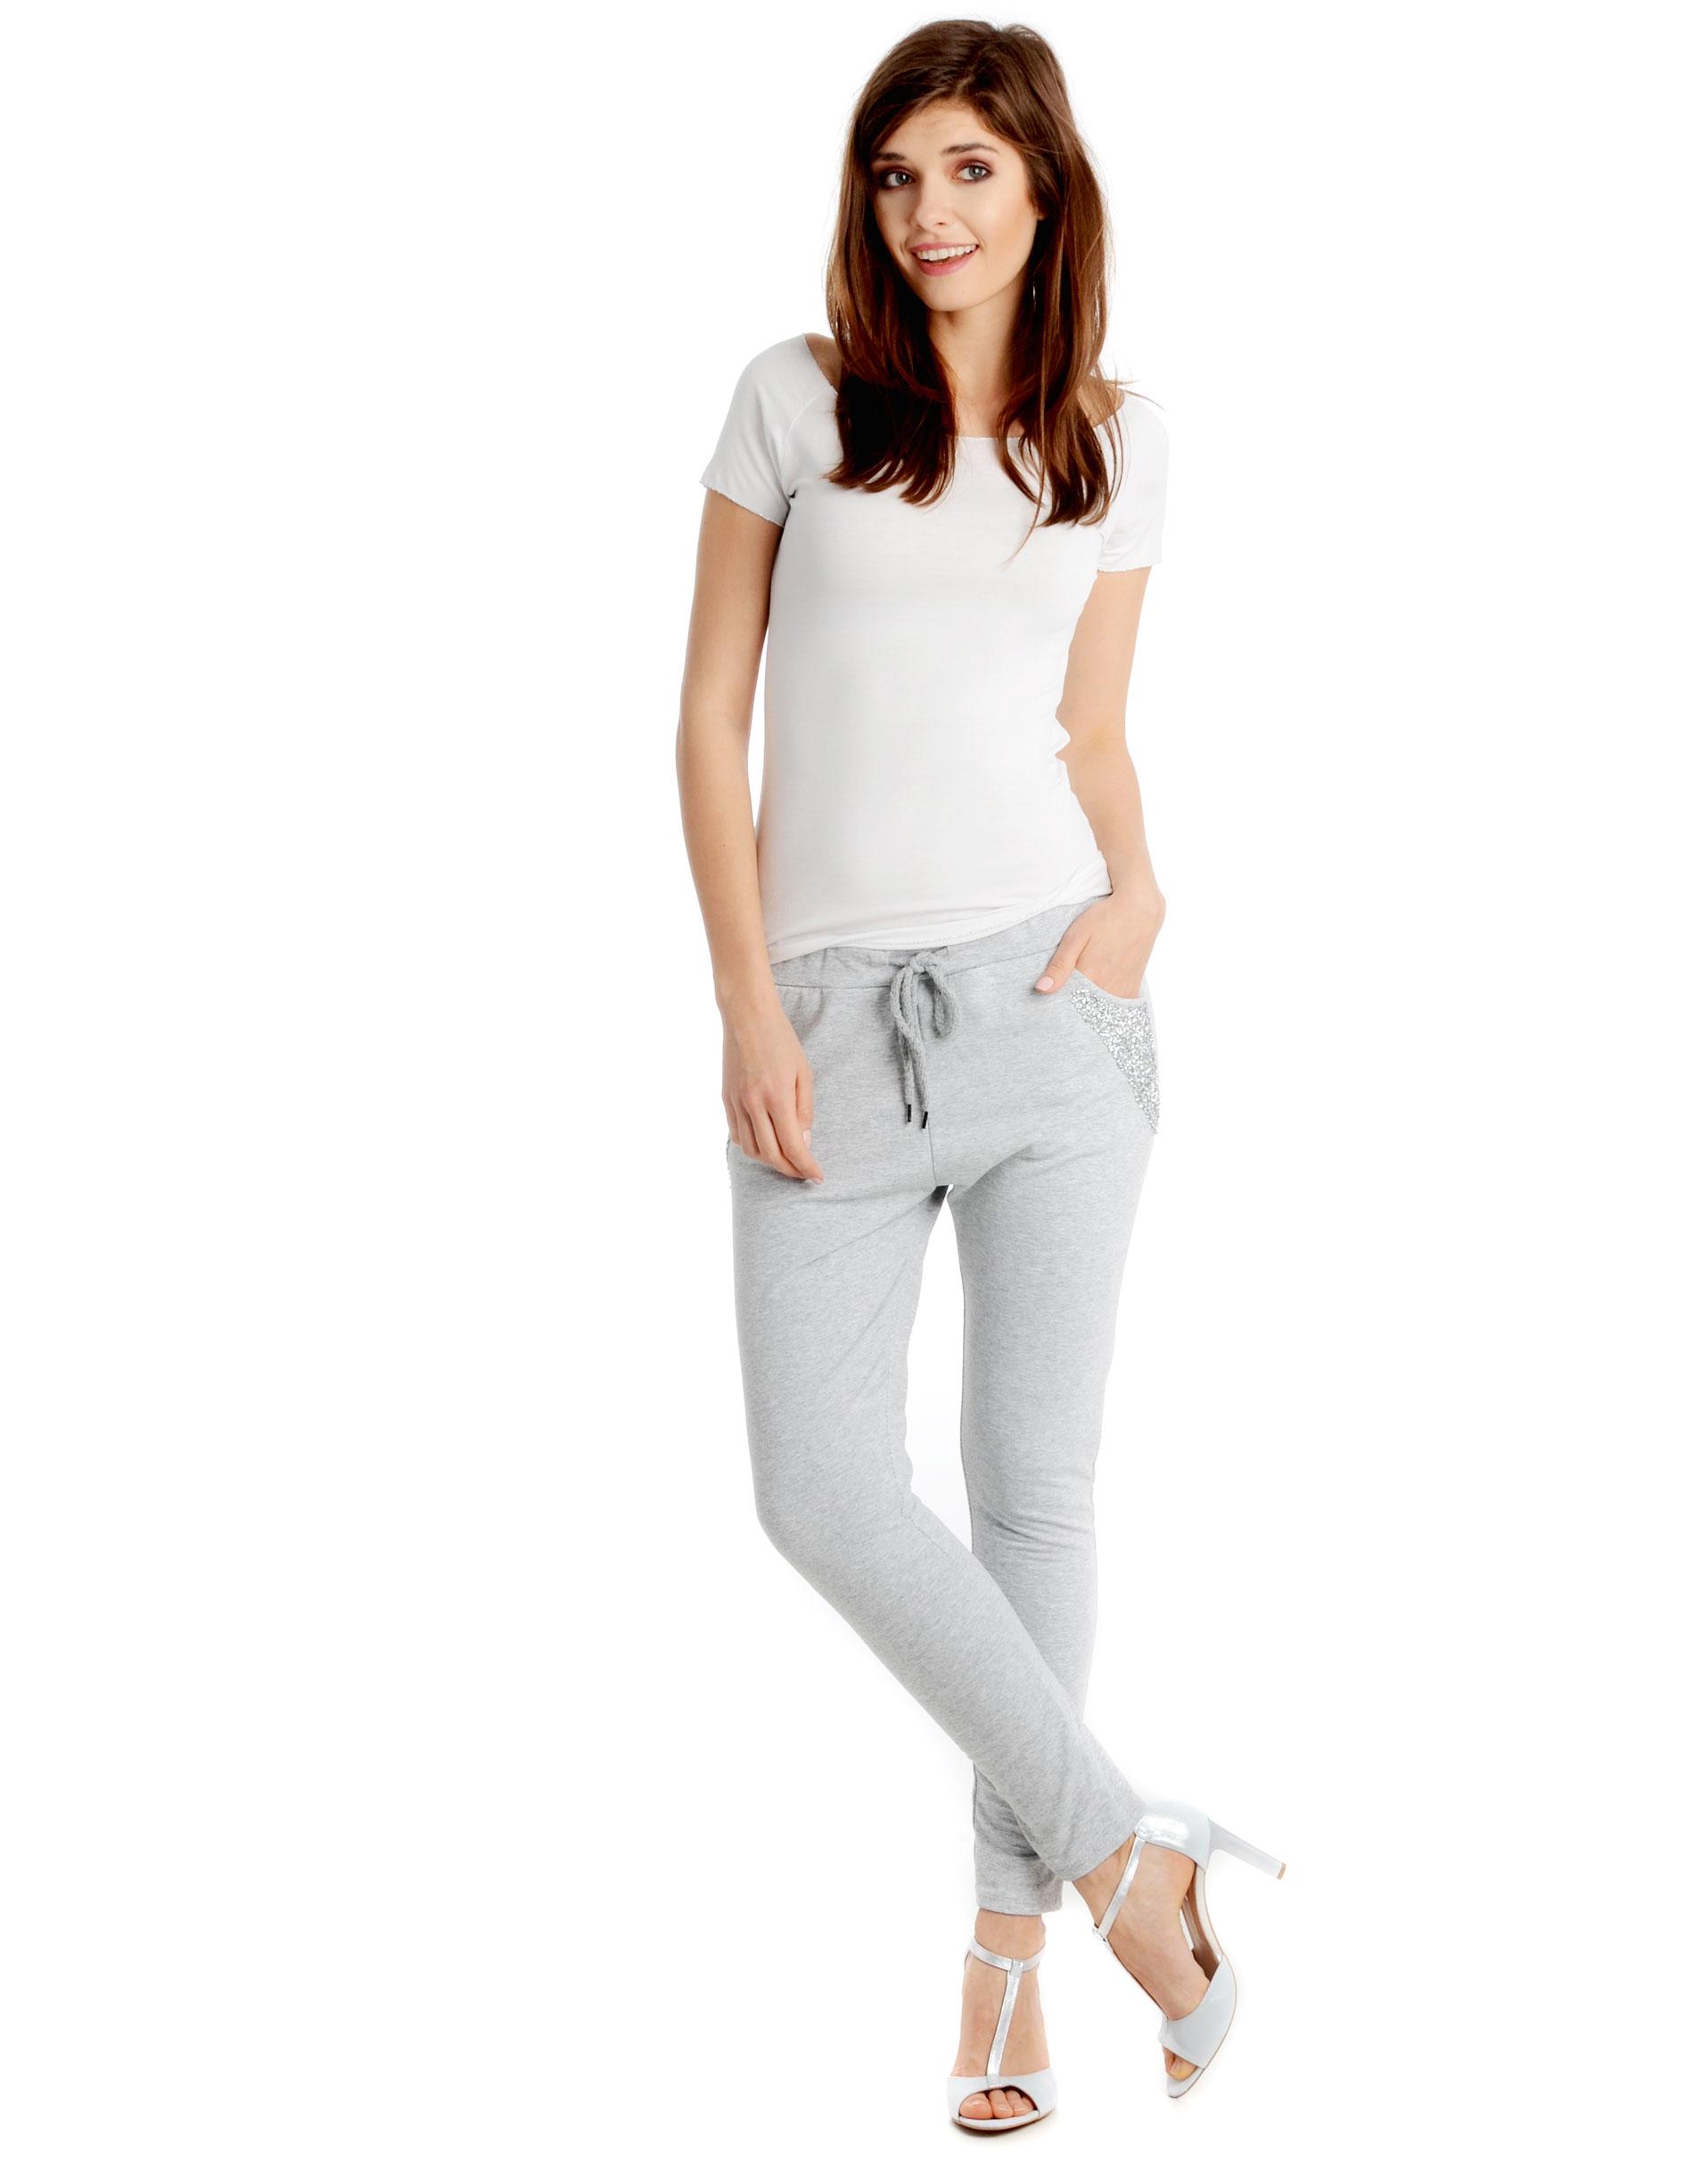 Spodnie - 63-9021 GRIGI - Unisono